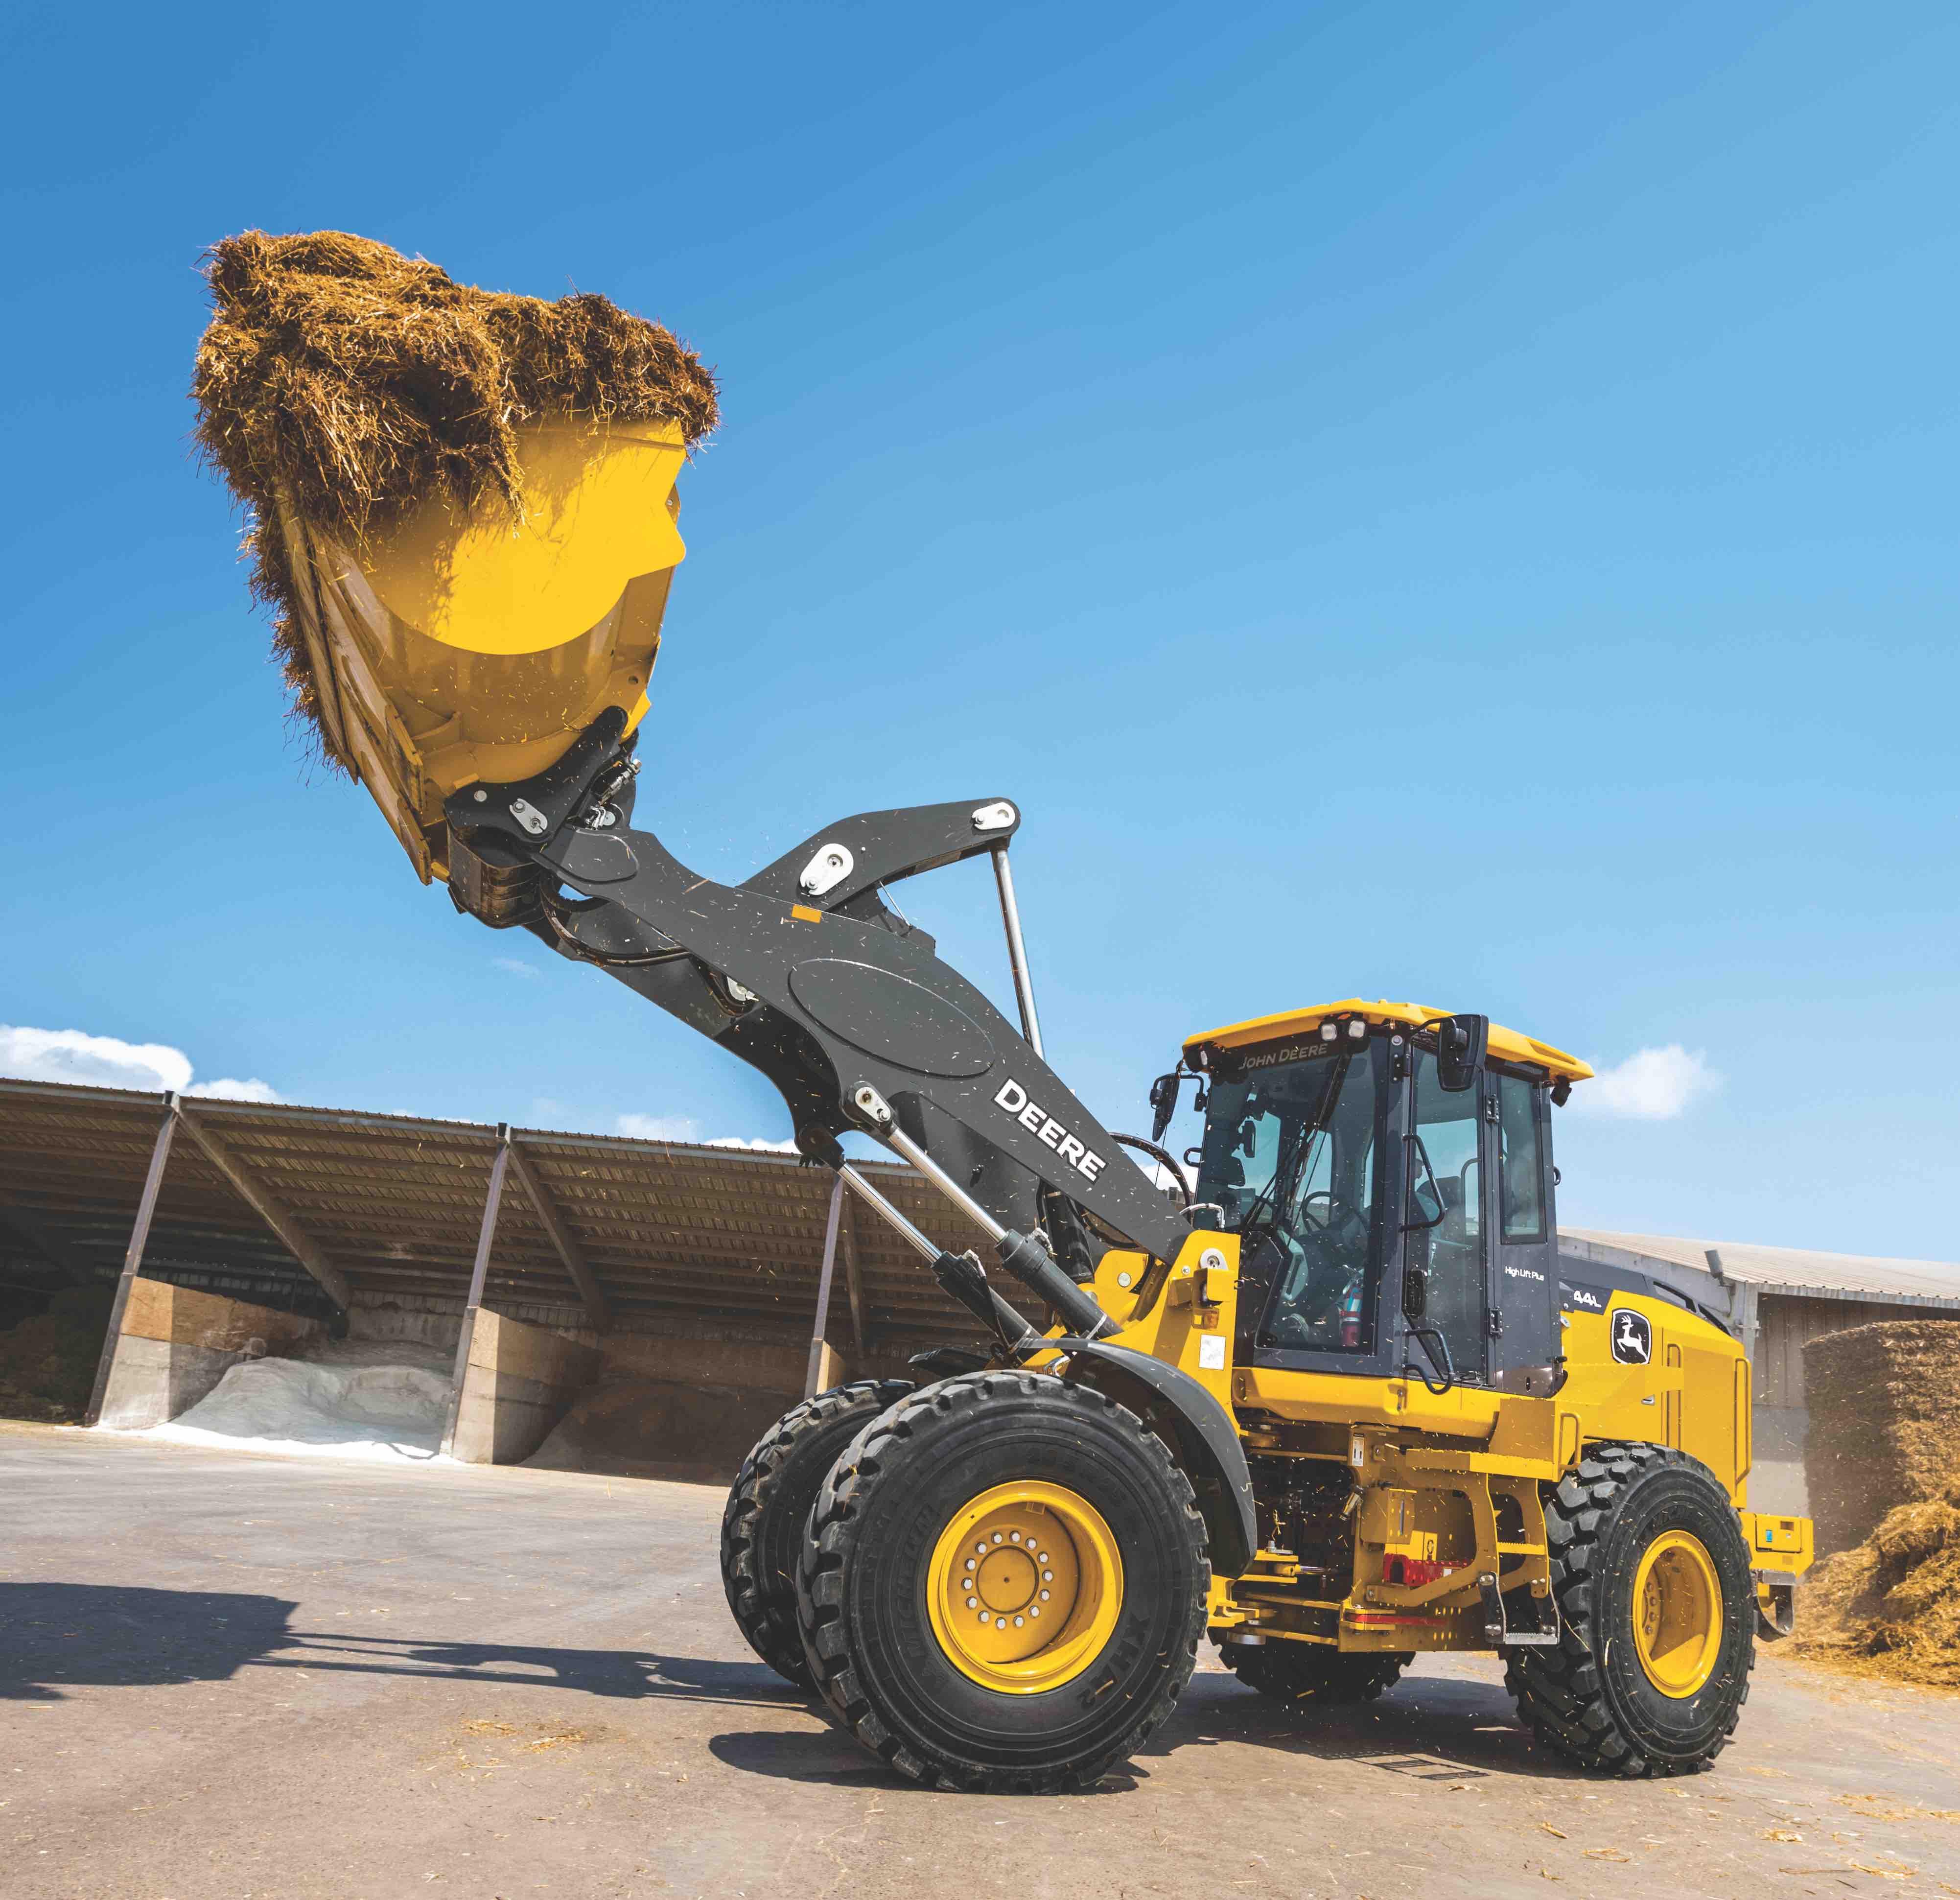 New John Deere L-Series Utility Wheel Loaders Primed To Take